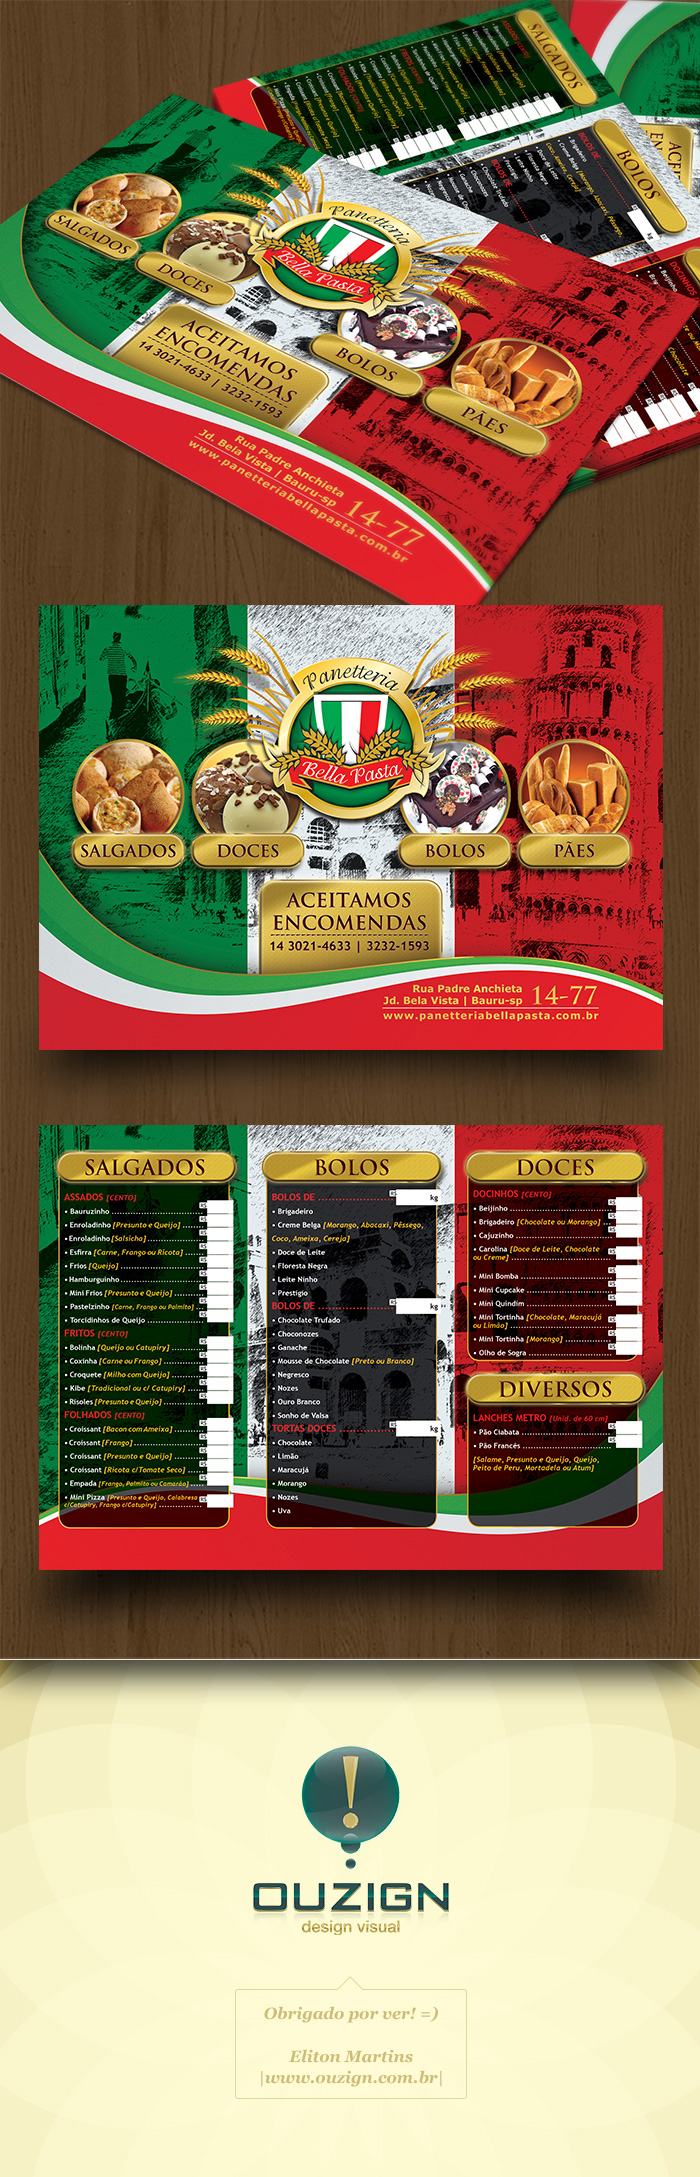 Flyer Panetteria Bella Pasta